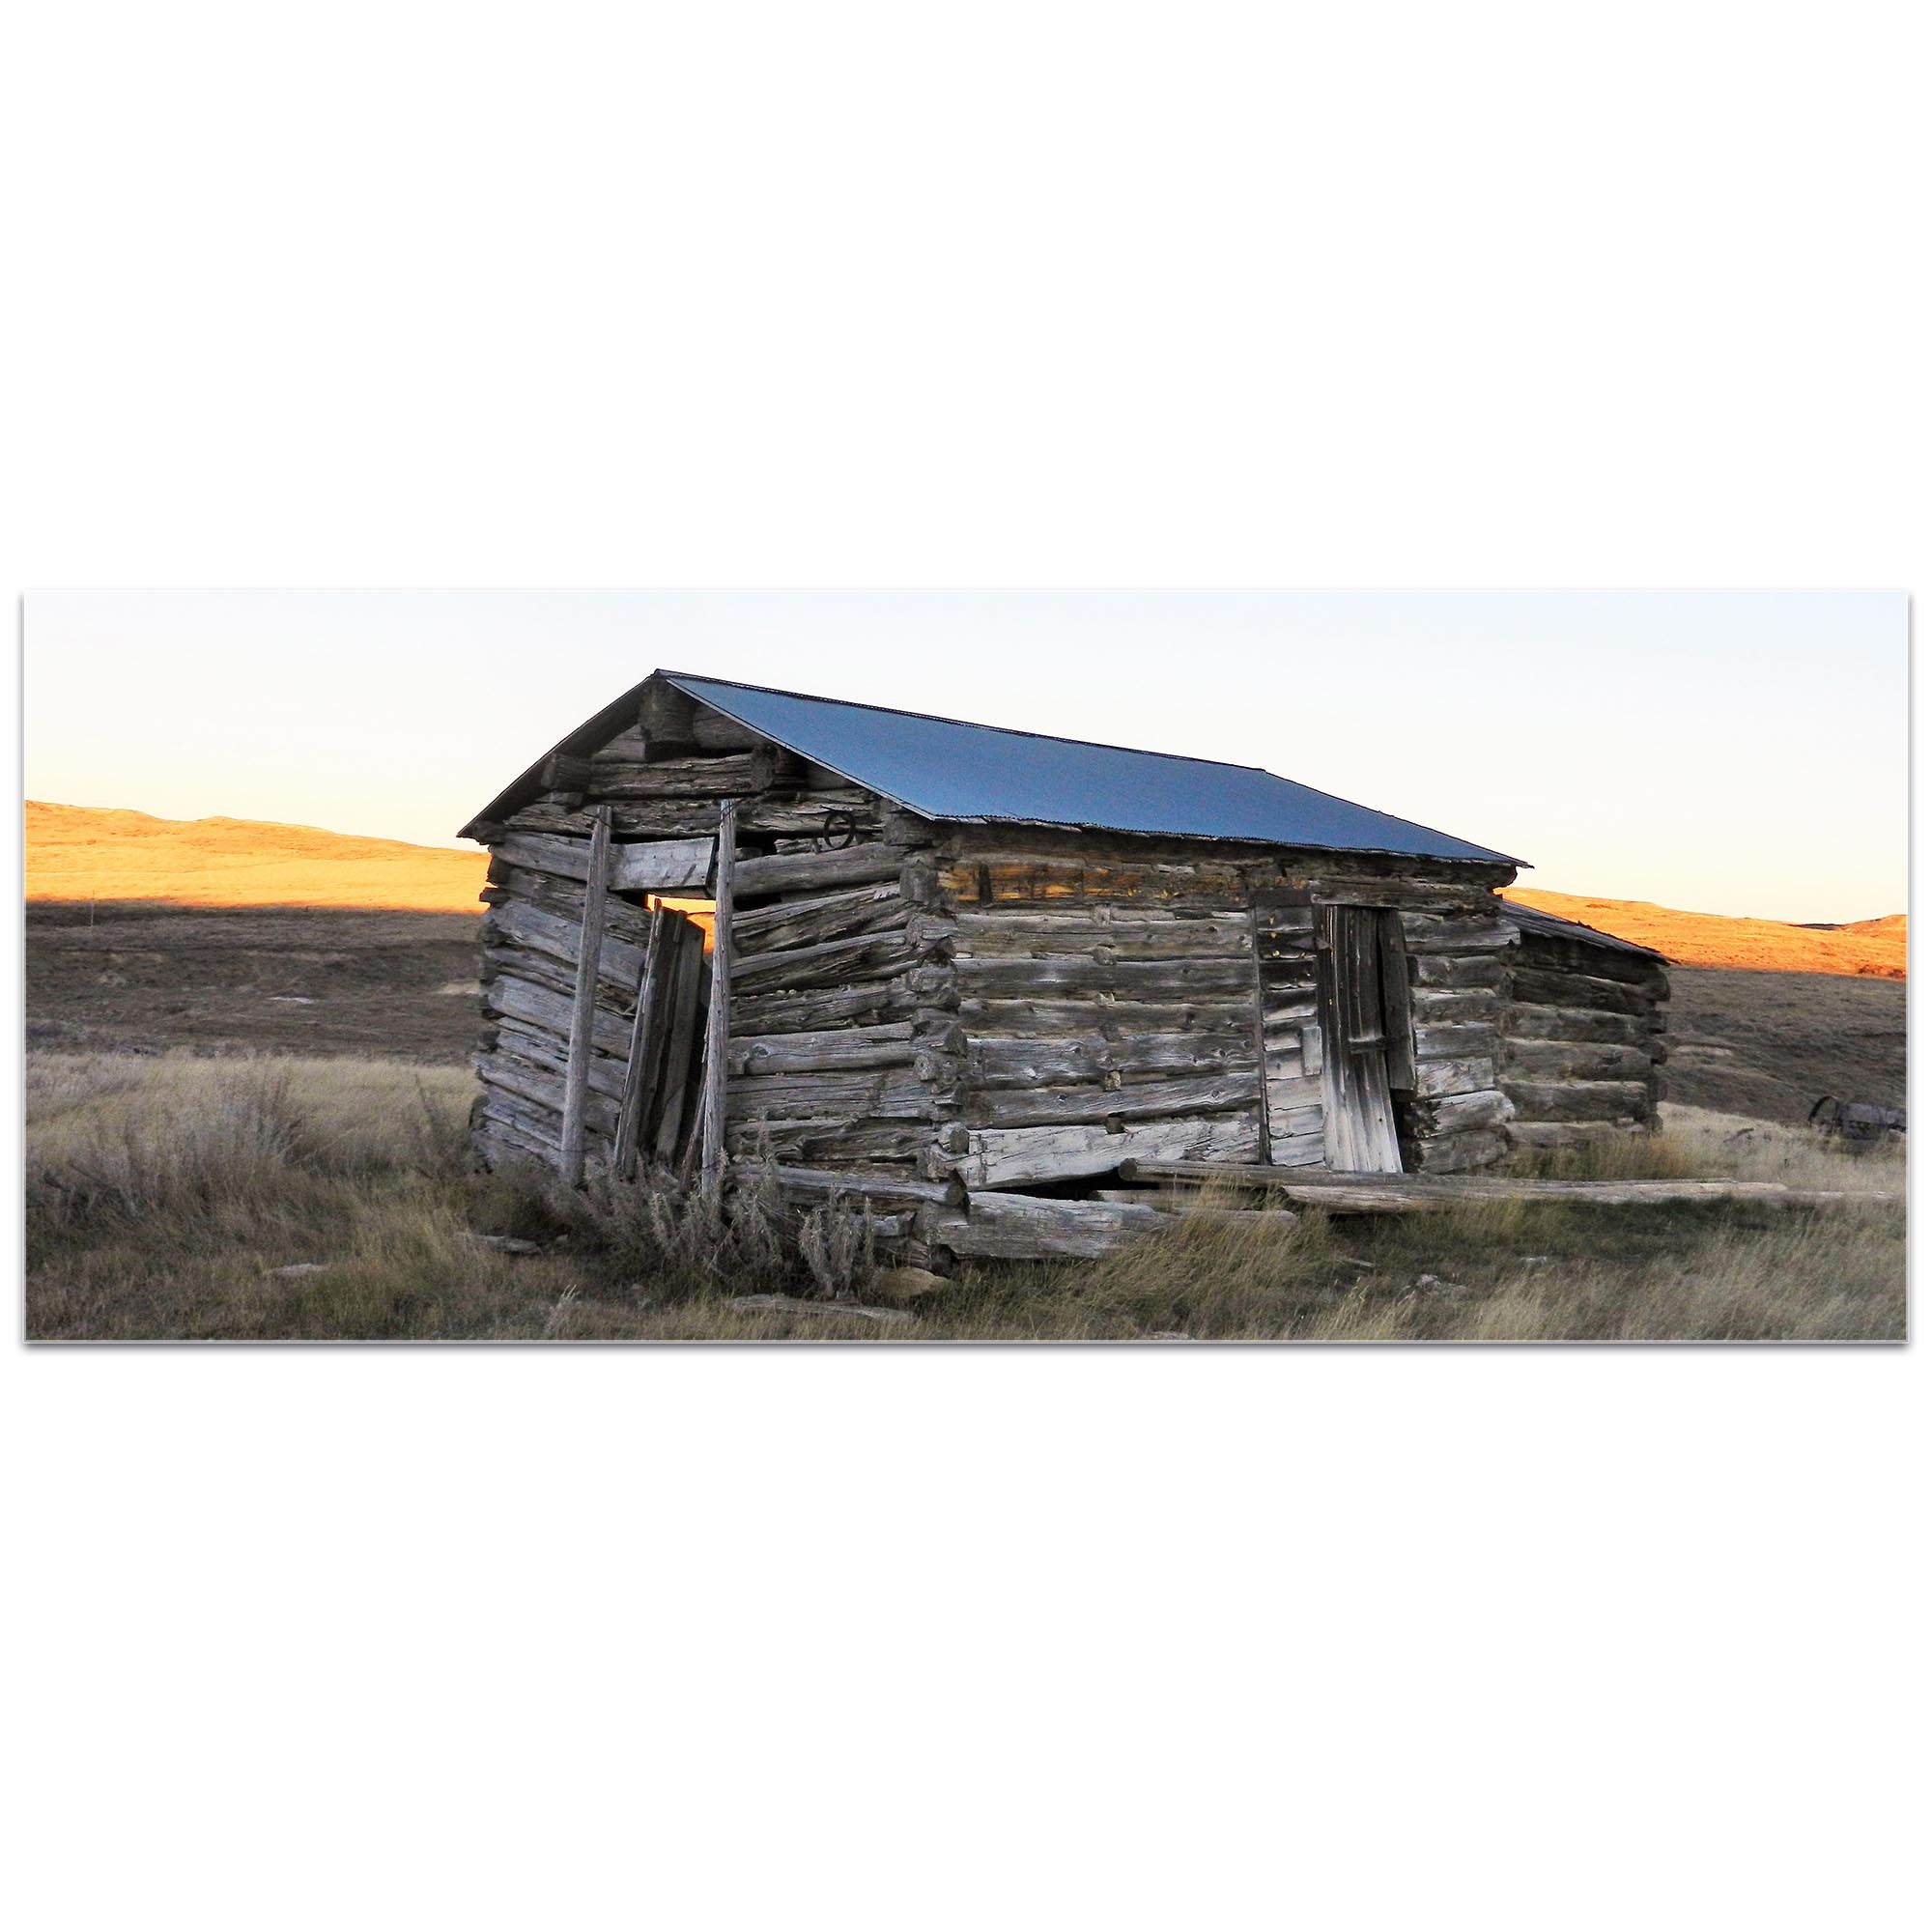 Western Wall Art 'The Log House' - American West Decor on Metal or Plexiglass - Image 2